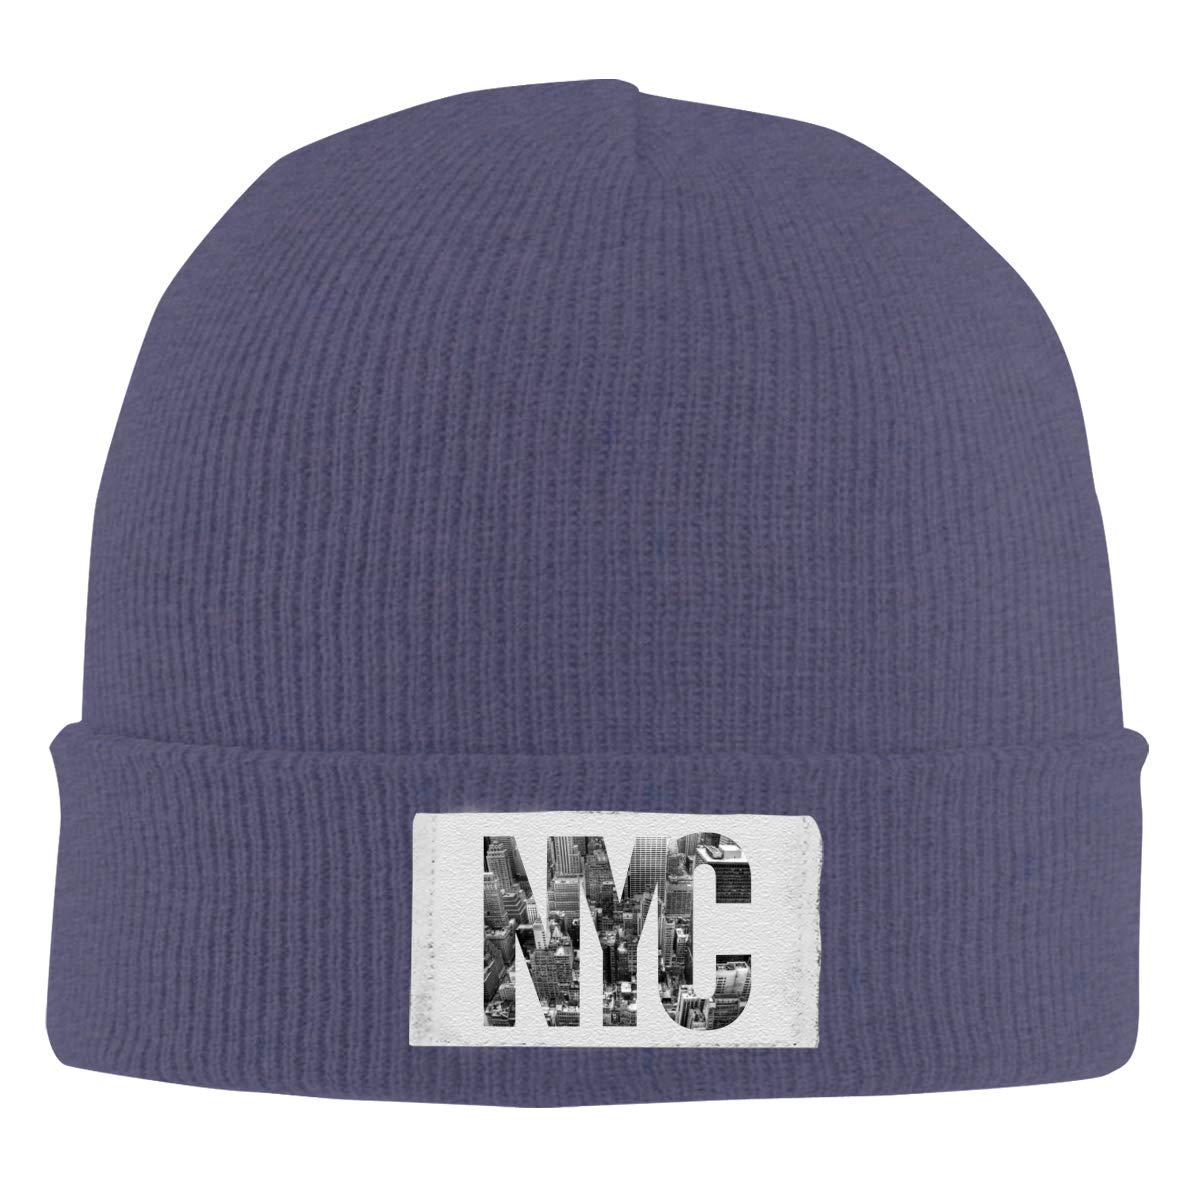 Stretchy Cuff Beanie Hat Black Dunpaiaa Skull Caps Newyork City Winter Warm Knit Hats